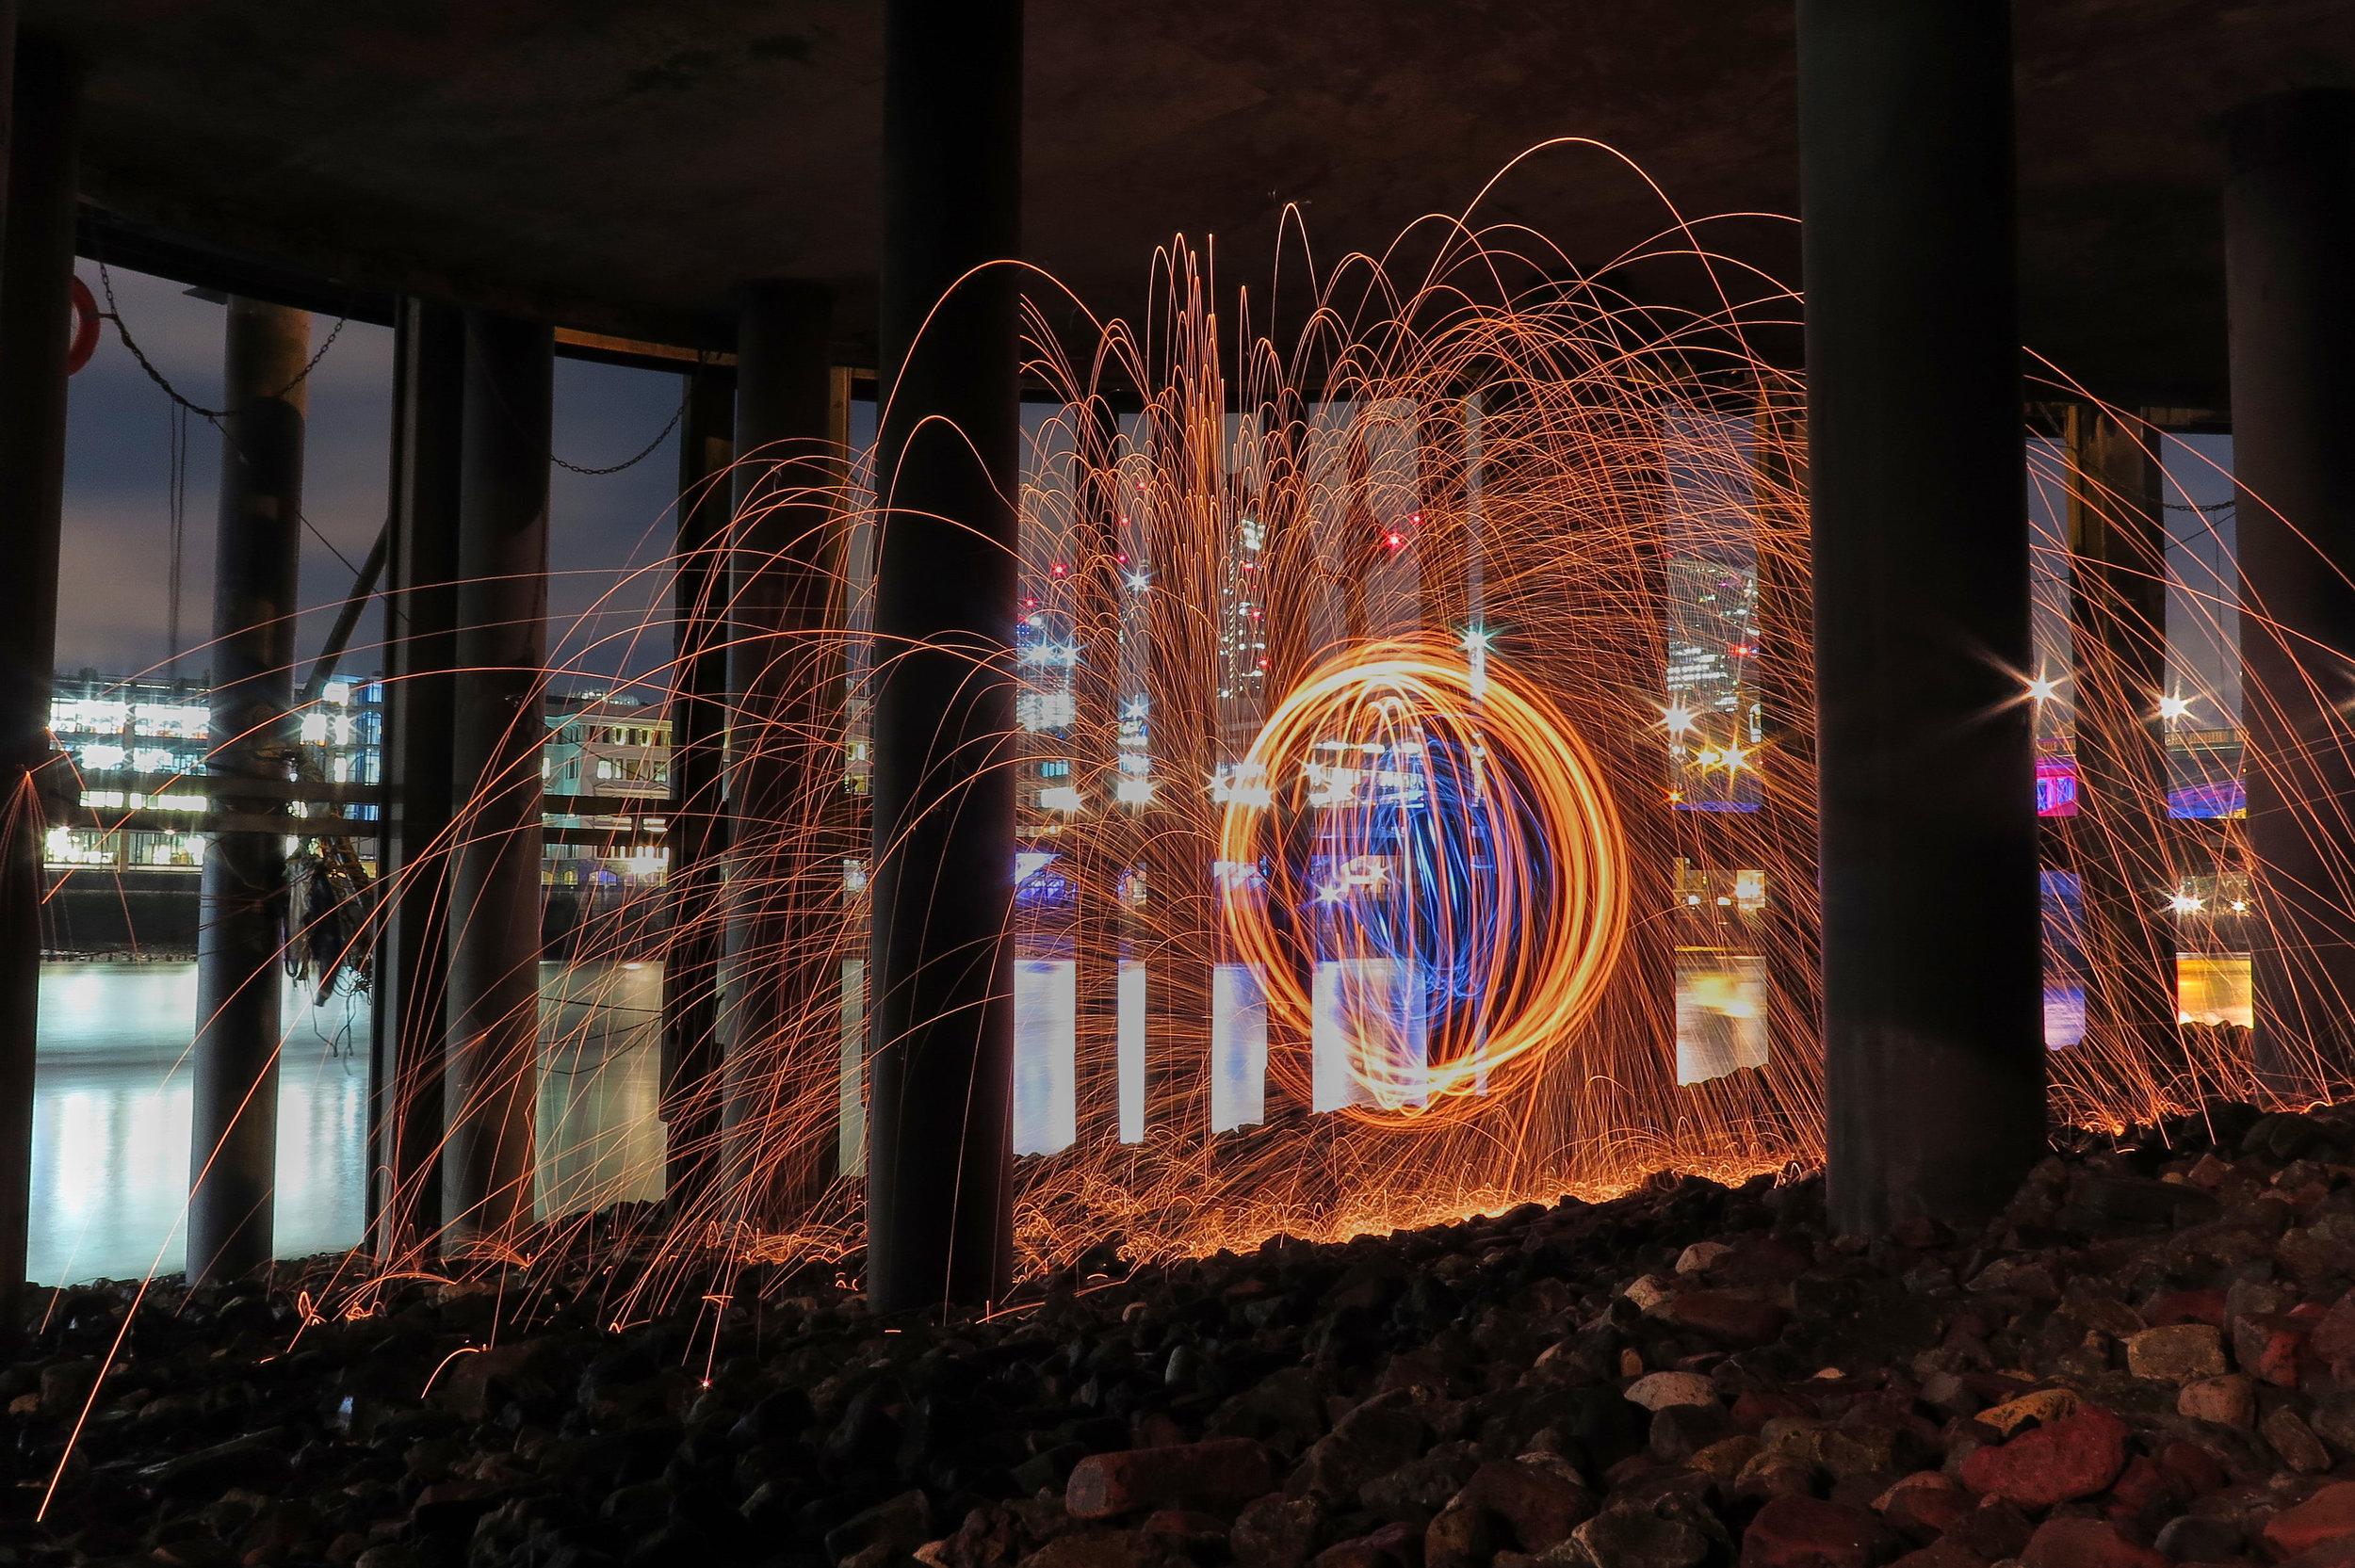 Night_Light_Fire_Workshop_001.jpg